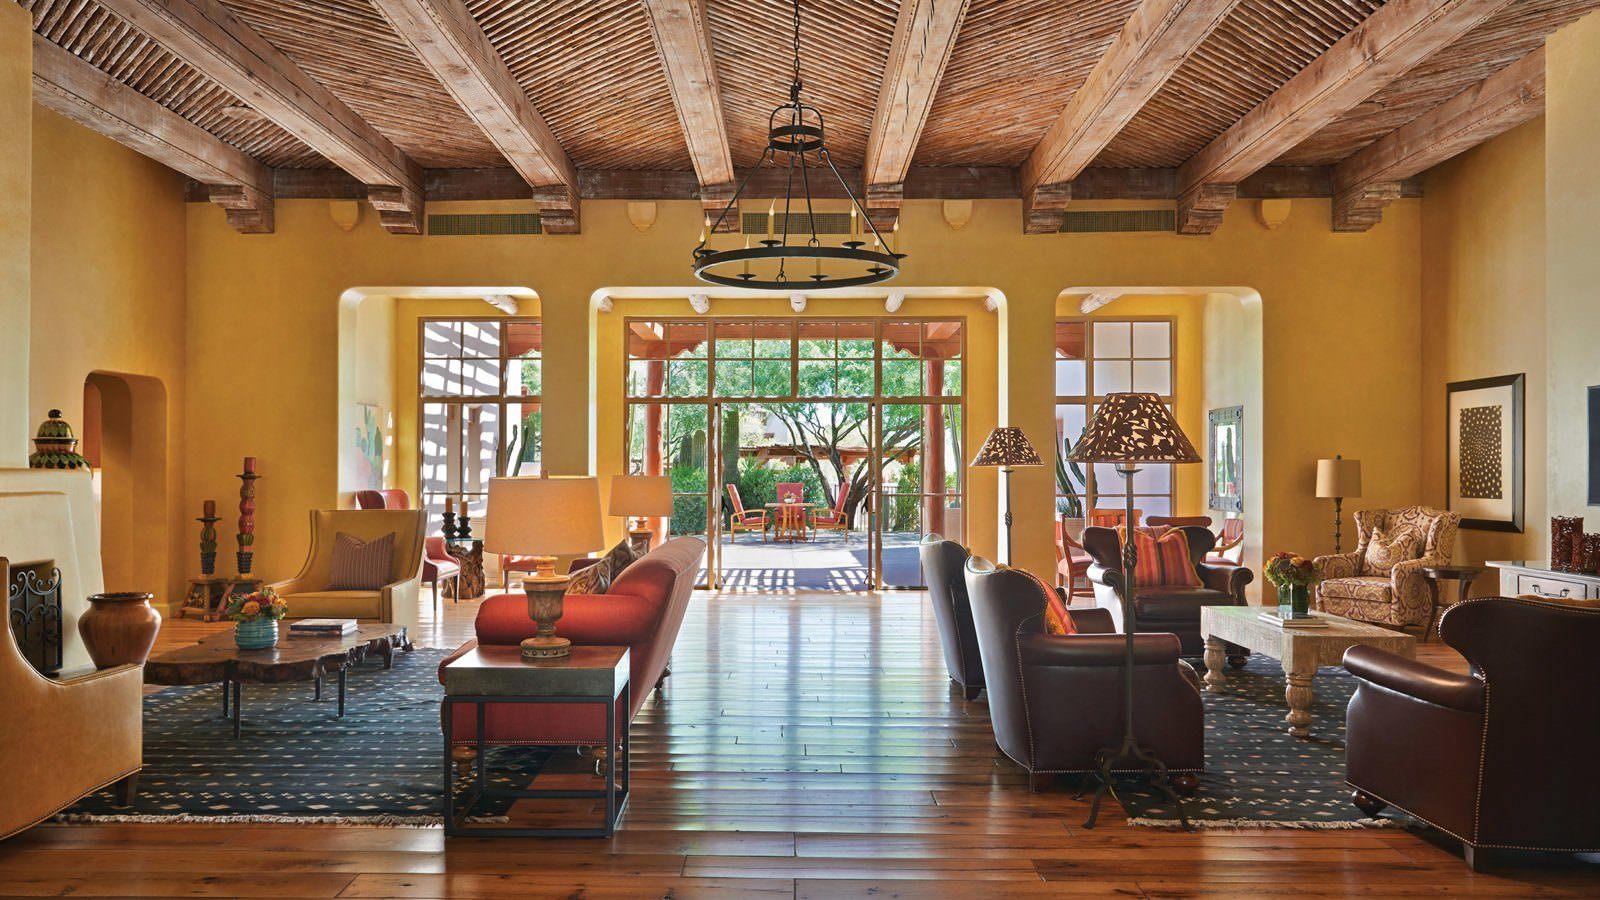 Ultimate List of Best Luxury Hotels in Scottsdale, Arizona, Four Seasons Resorts Scottsdale at Troon North